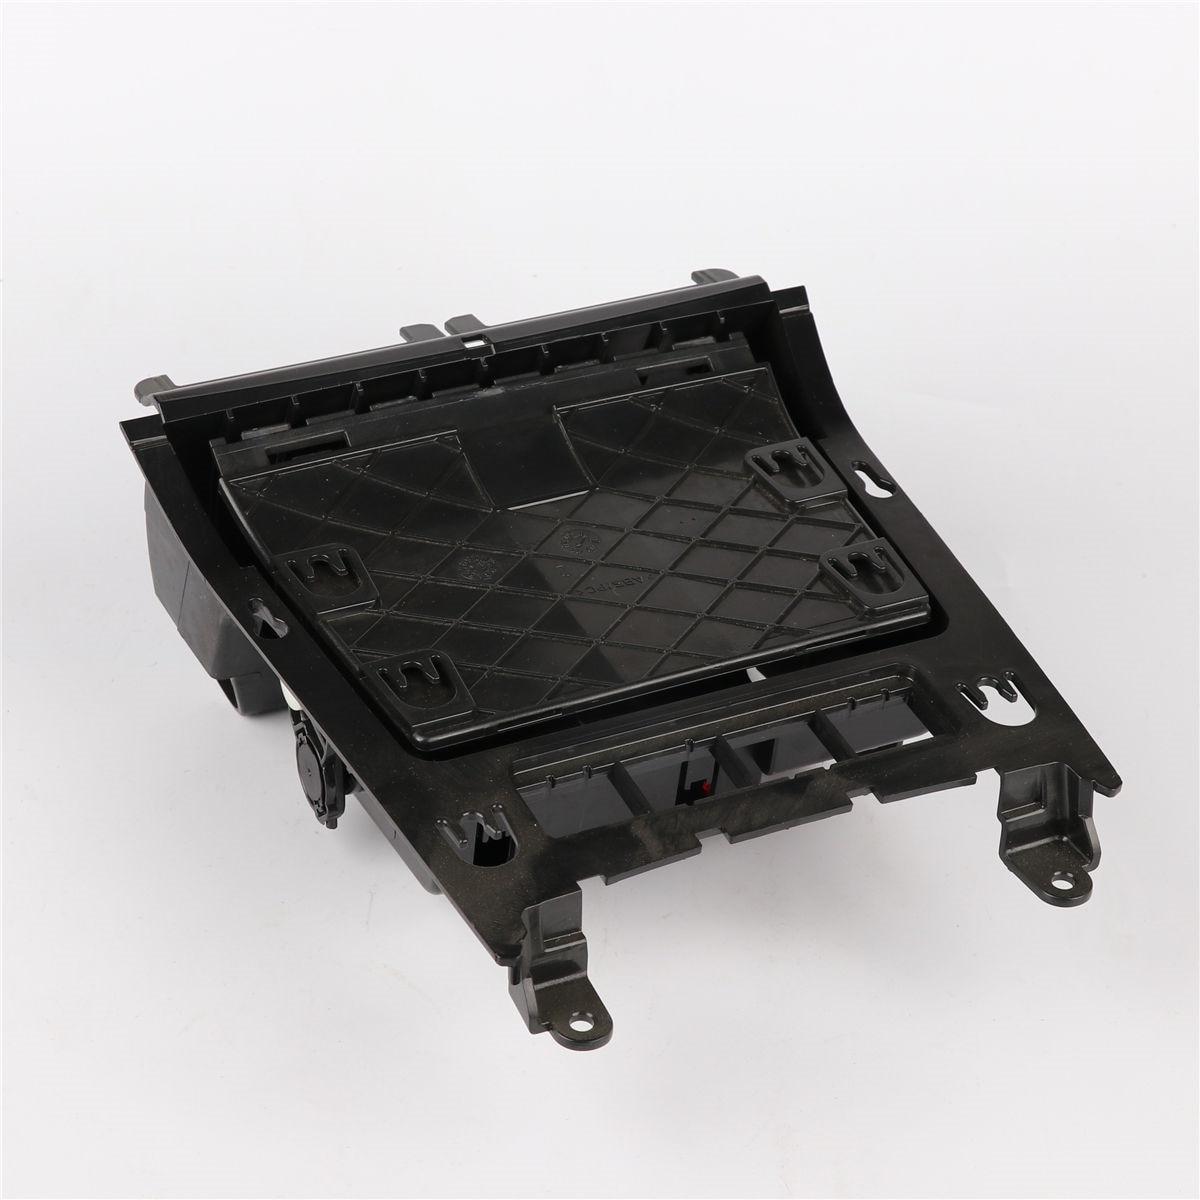 OEM 1Pcs Car Ash Tray Ashtray Rubbish Case For VW 1K0 857 961 9B9 Jetta 2006-2012 Golf sportsvan 2007-200 Eos 2006-2008 oem new rcd310 1k0 035 186an 1k0 035 186 ar for bosch vw